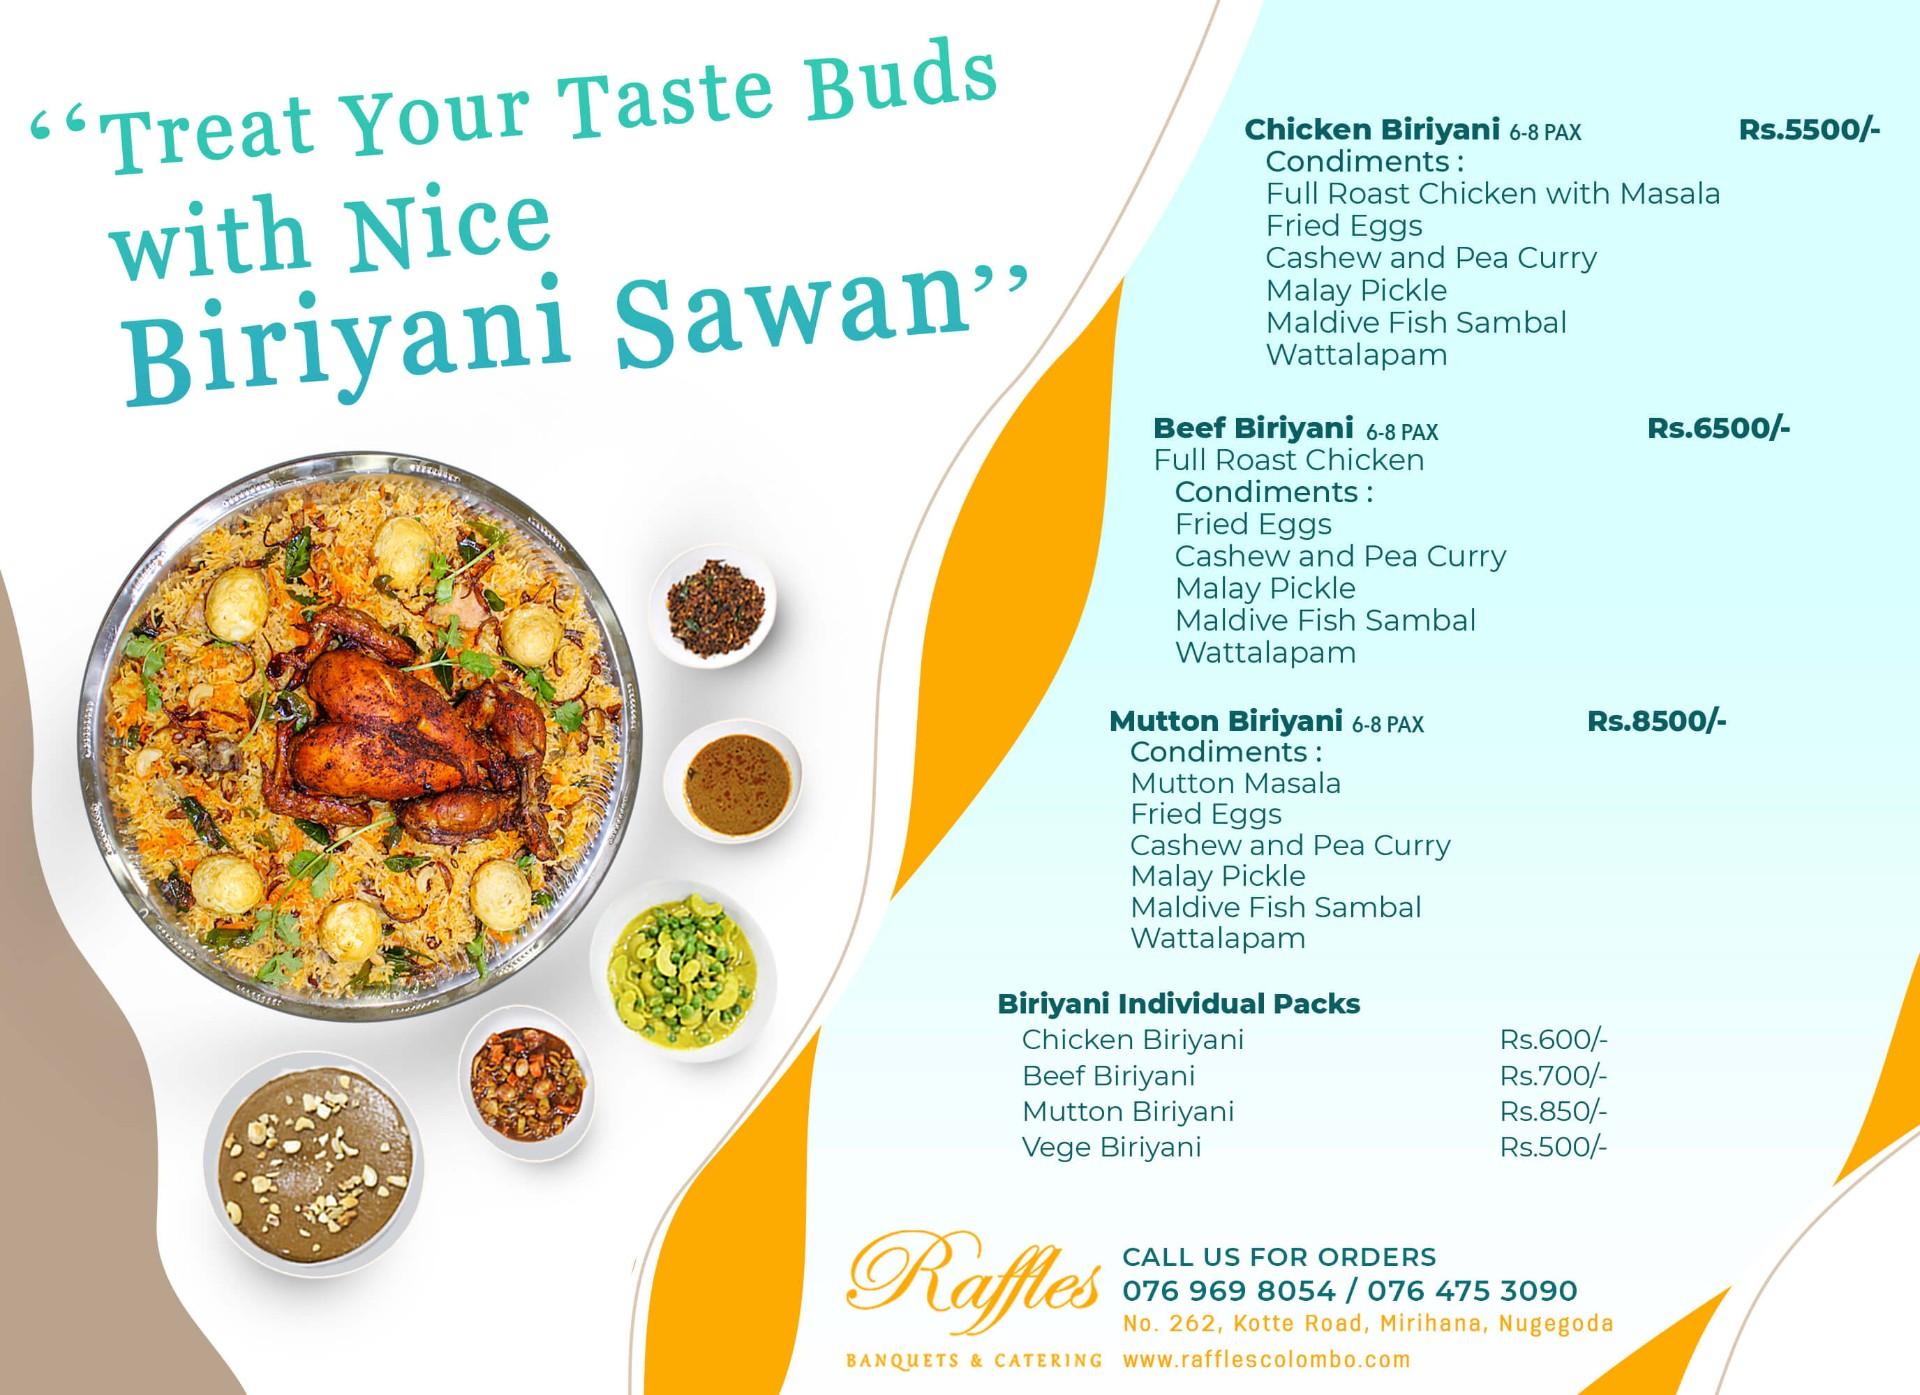 Treat your taste buds with nice Biriyani Sawan!